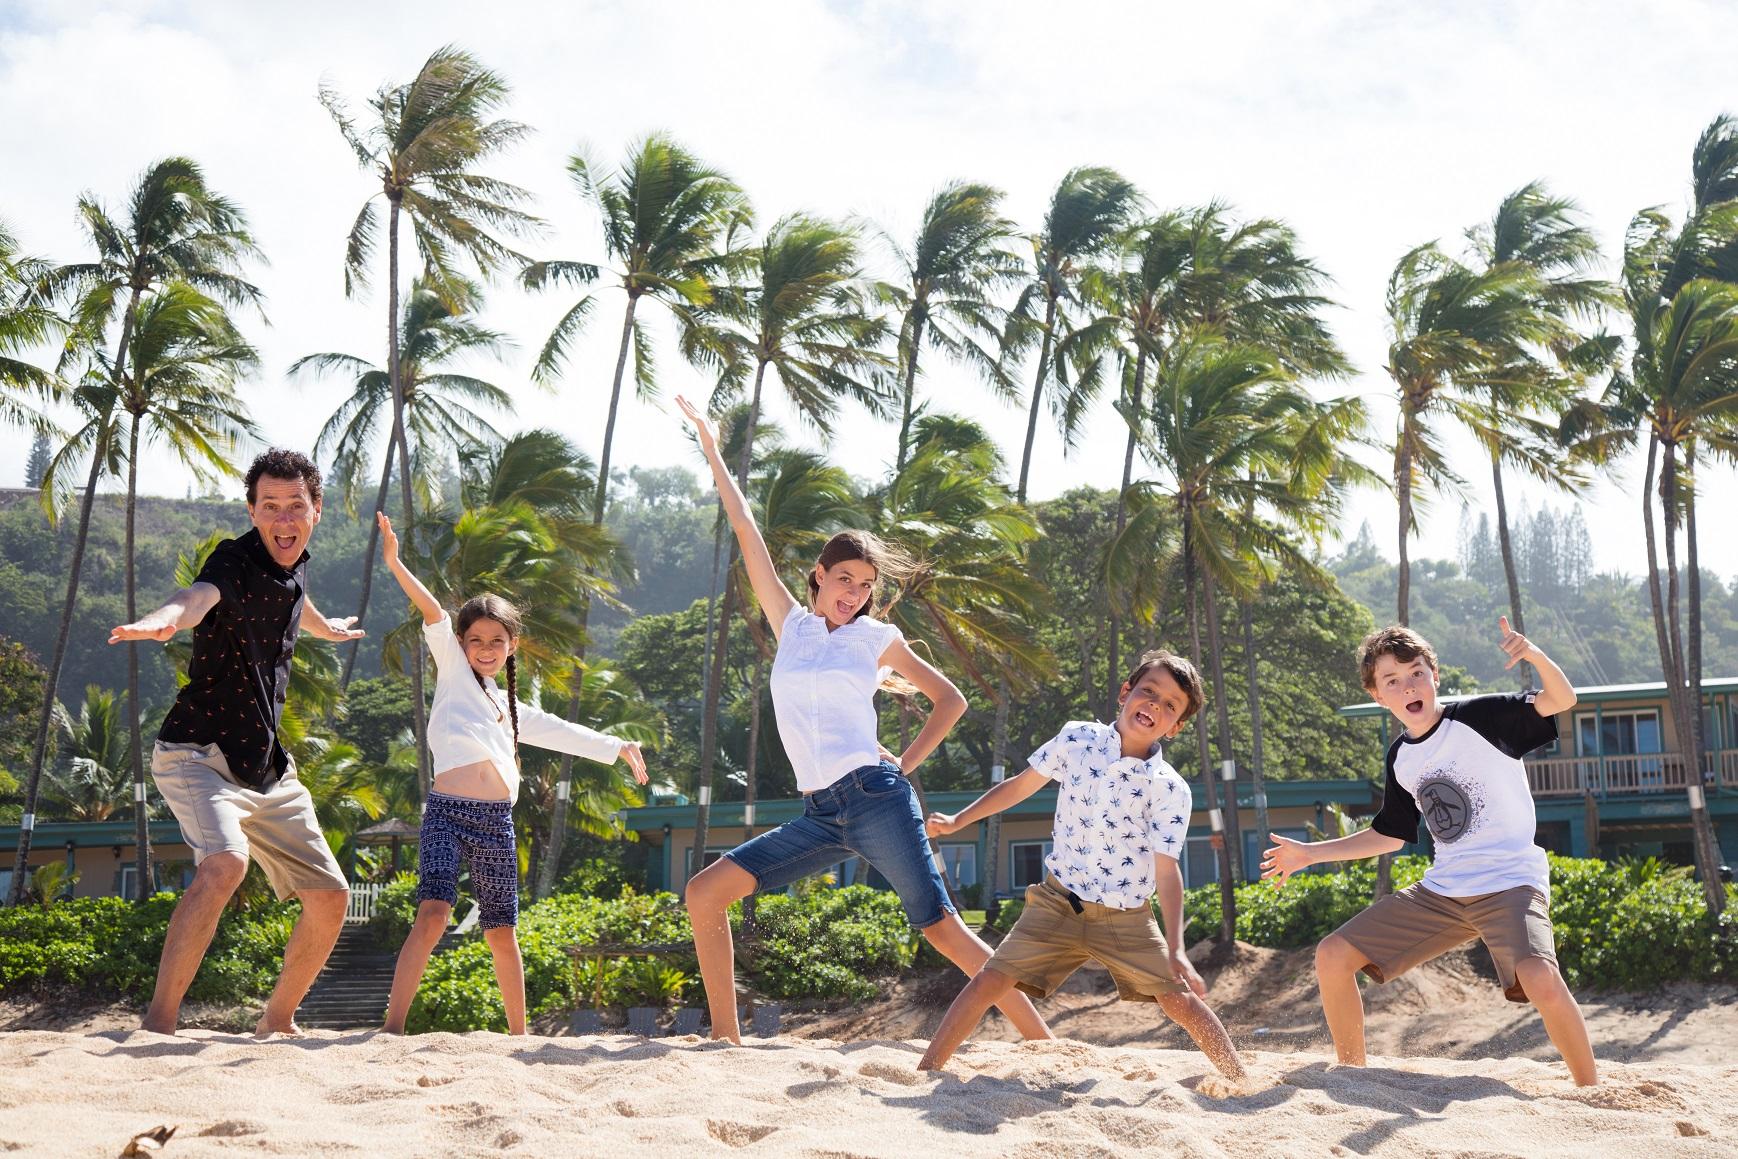 family beach fun waikiki honolulu oahu photography